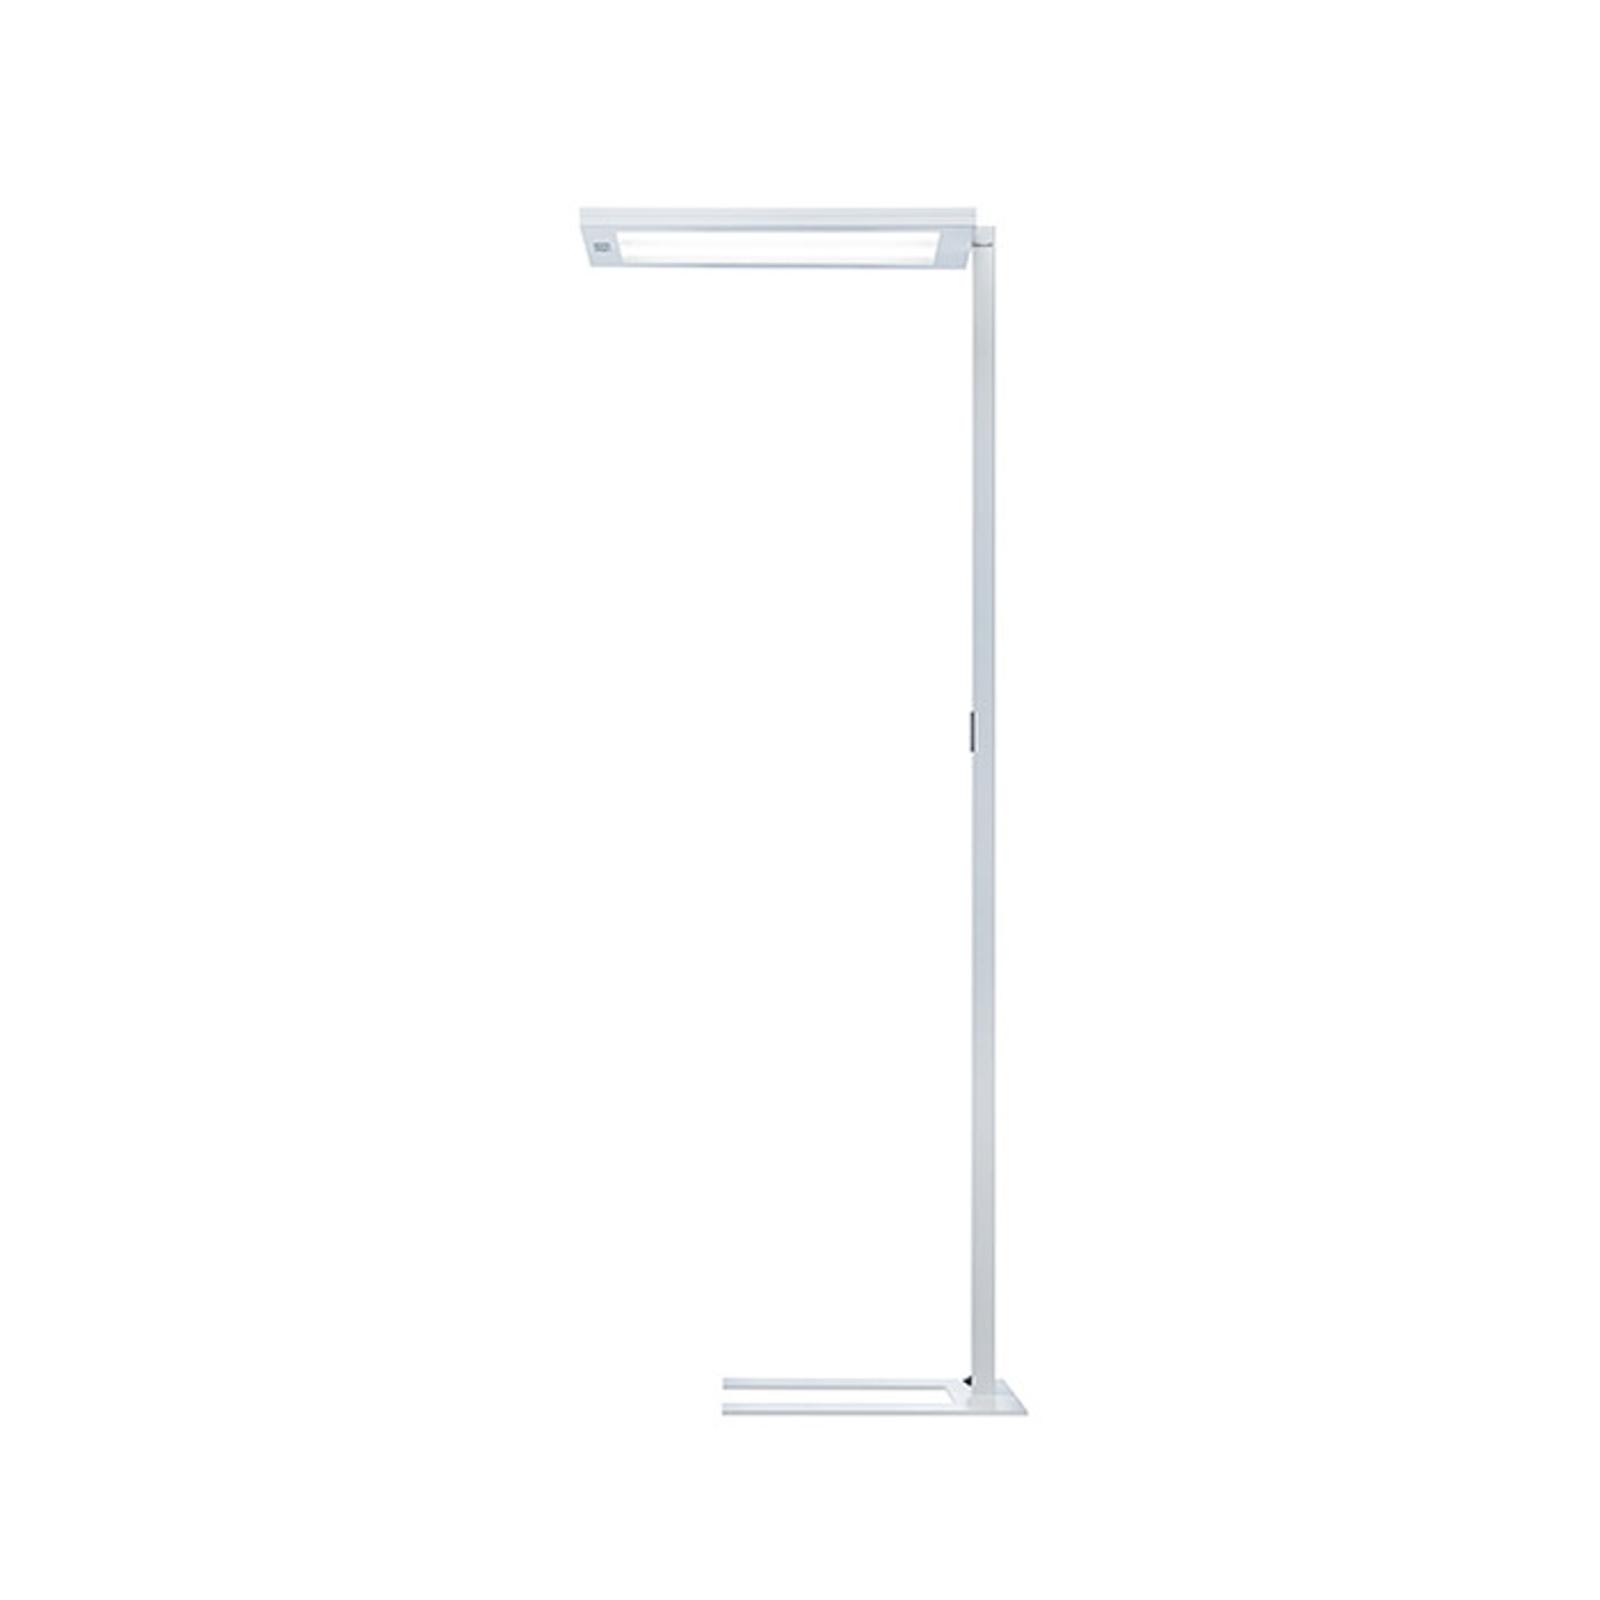 LED-Stehlampe Lavigo DPS 16500/840/R/G2 weiß